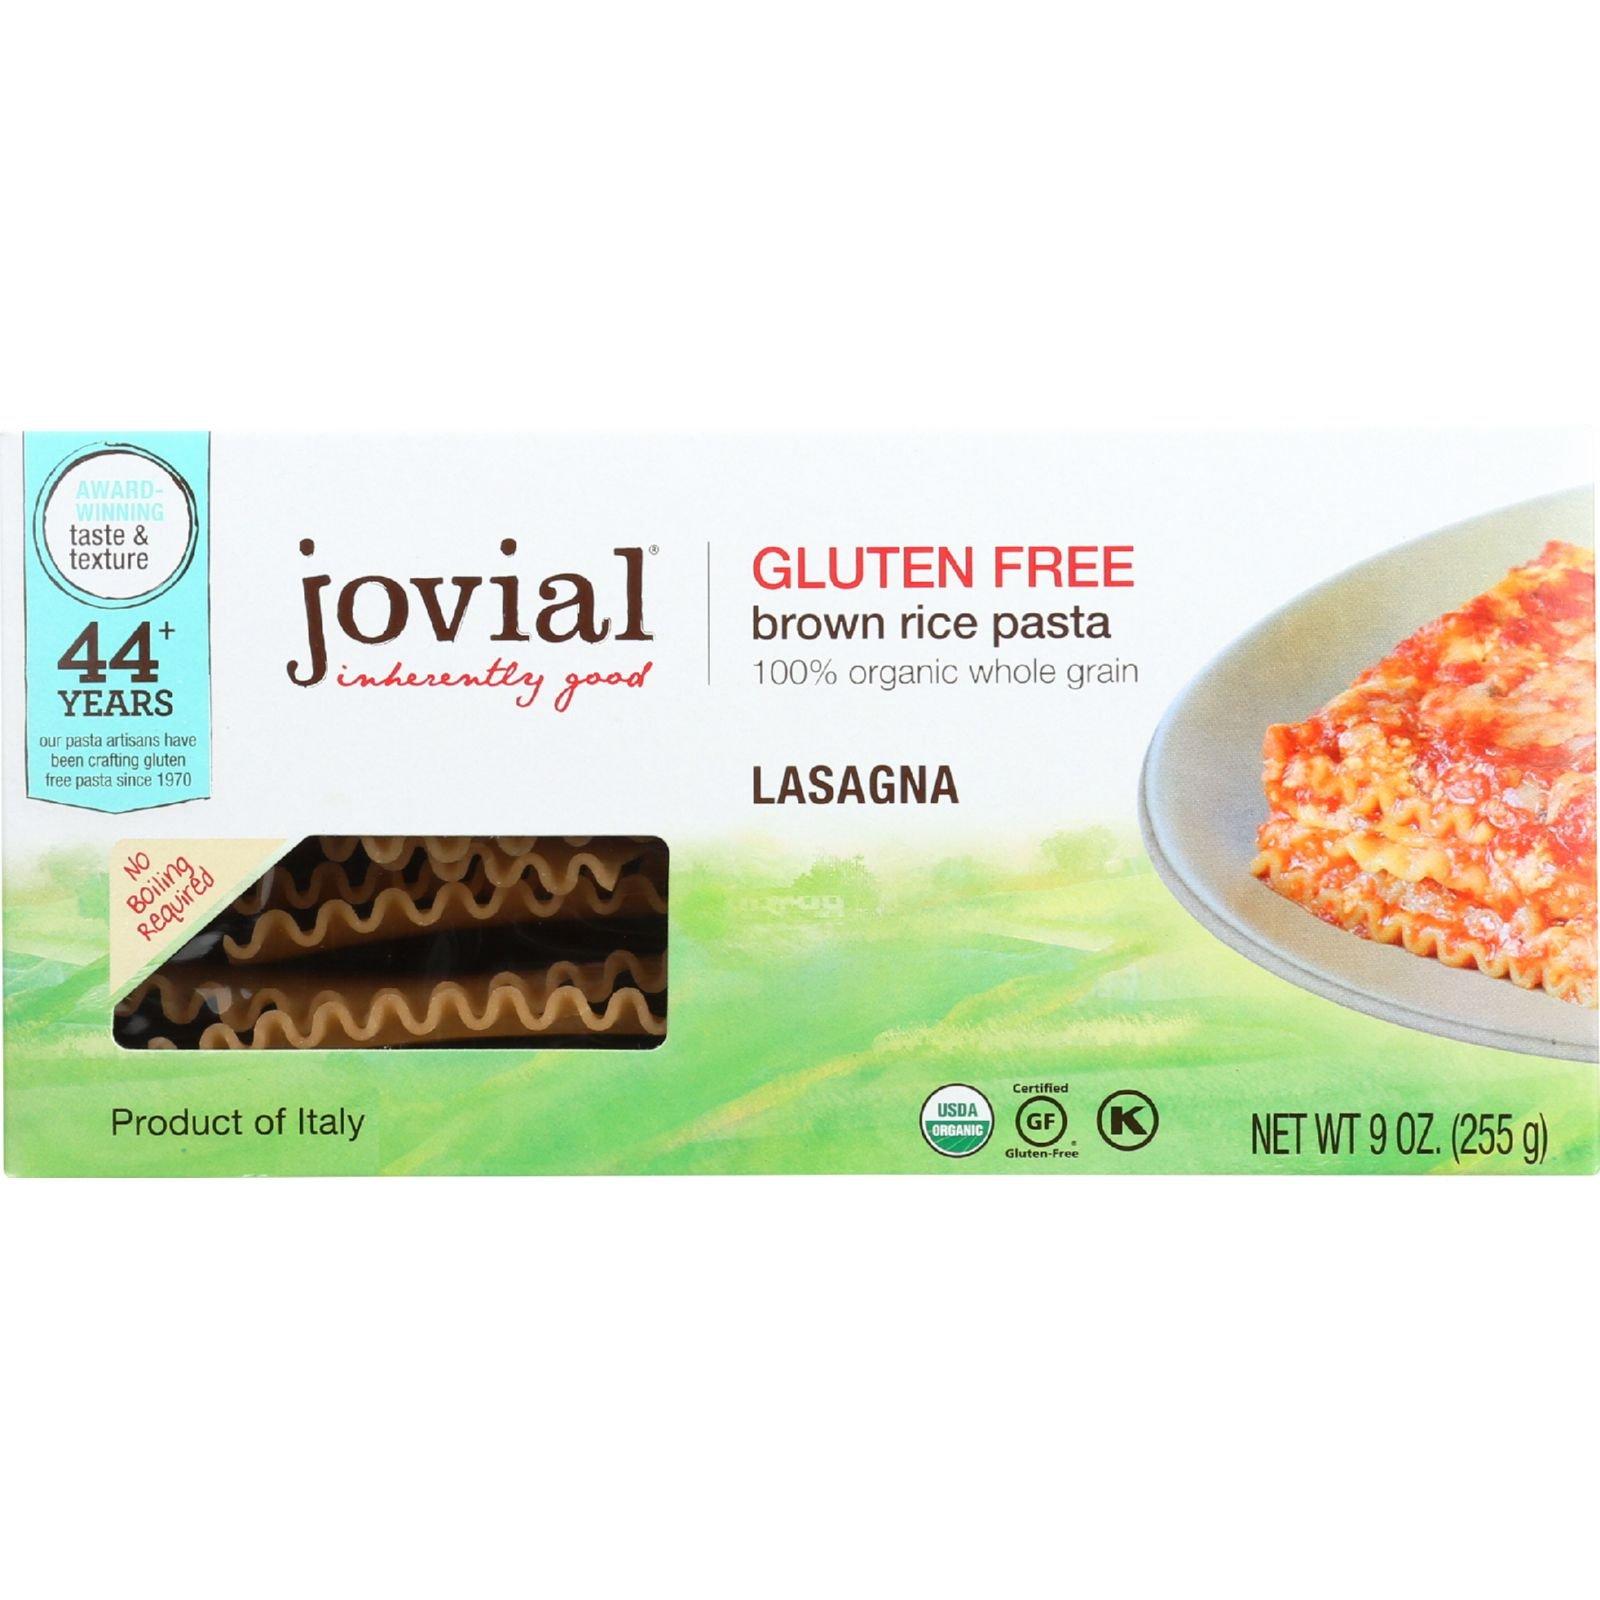 Jovial Pasta - Organic - Brown Rice - Lasagna - 9 oz - case of 12 - 100% Organic - Gluten Free - Dairy Free - Yeast Free - Wheat Free-Vegan by Jovial